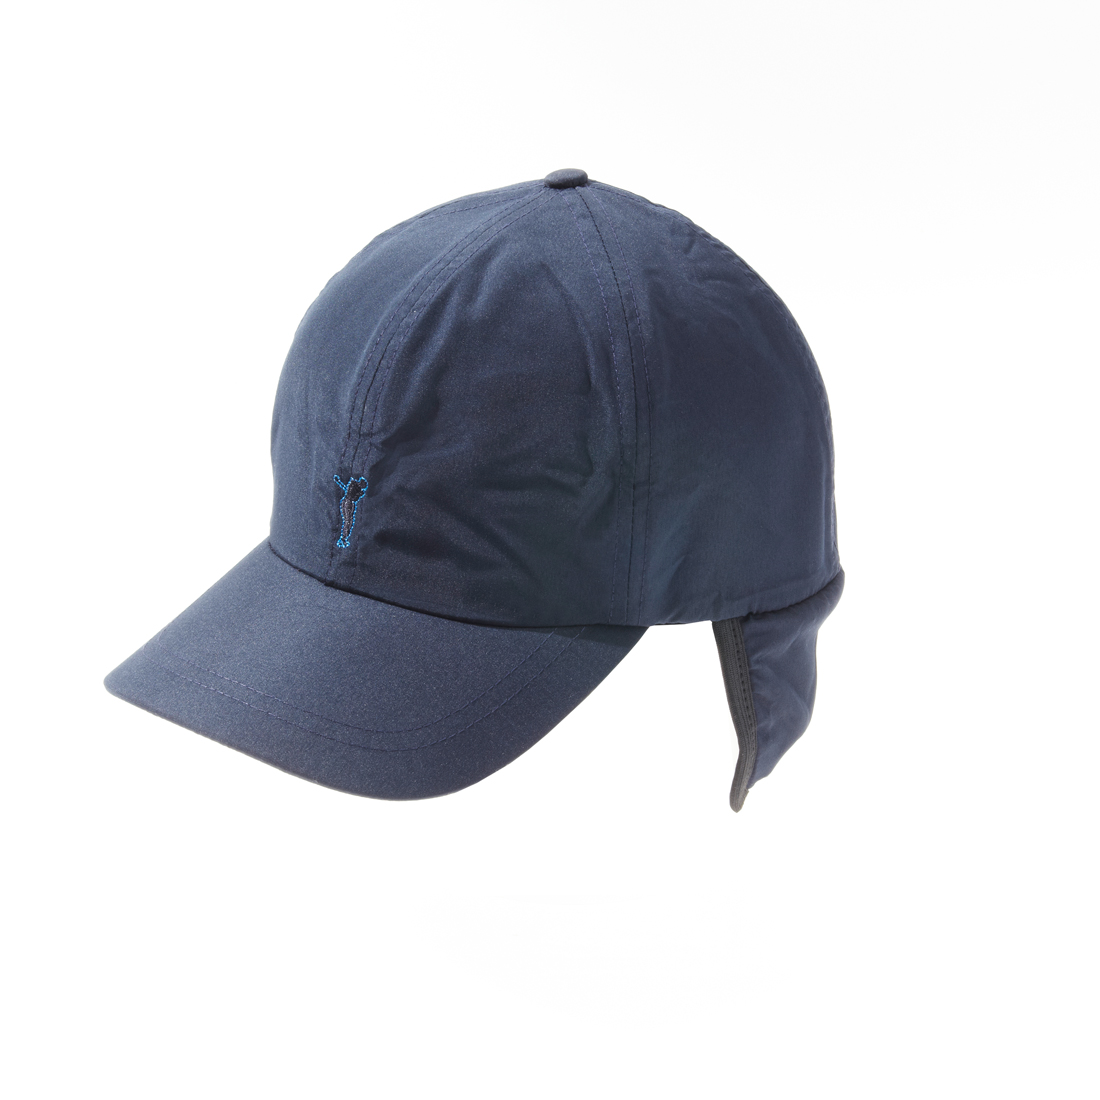 Cap mit Ohrenklappen Navy